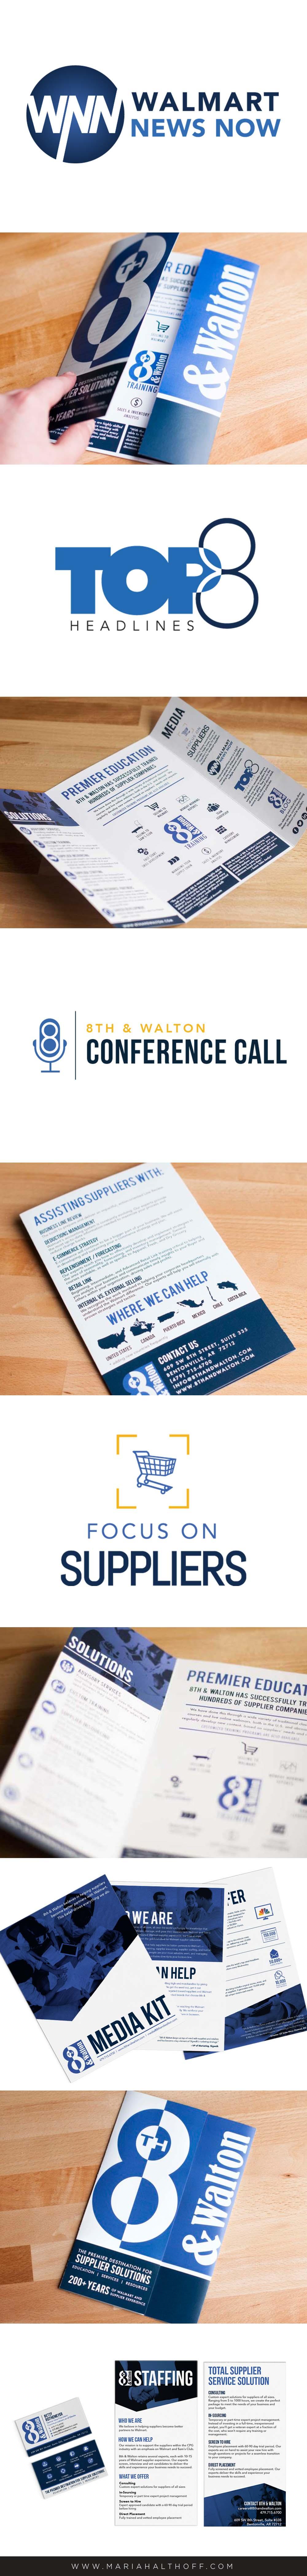 Logo Design, Brand Design, Business Card Design, Media Kit Design, Corporate Graphic Design, Print Design